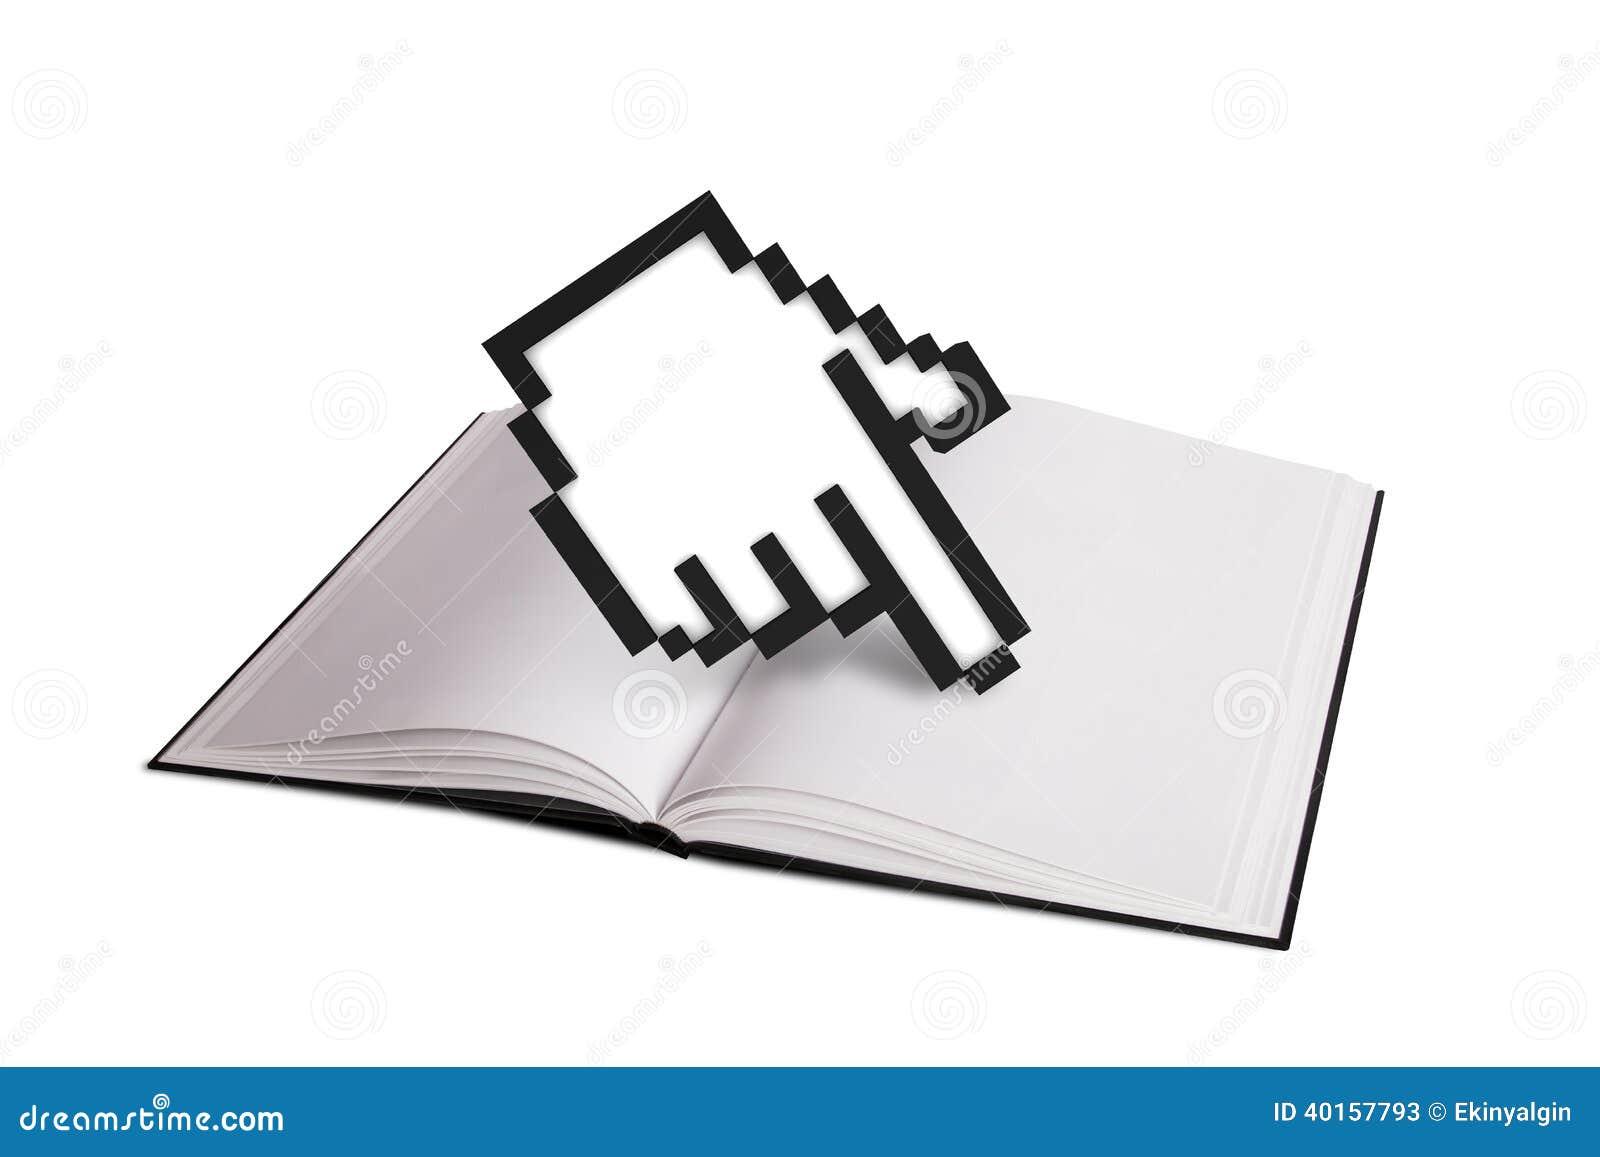 Open Hand Cursor Open Book and Hand Cursor